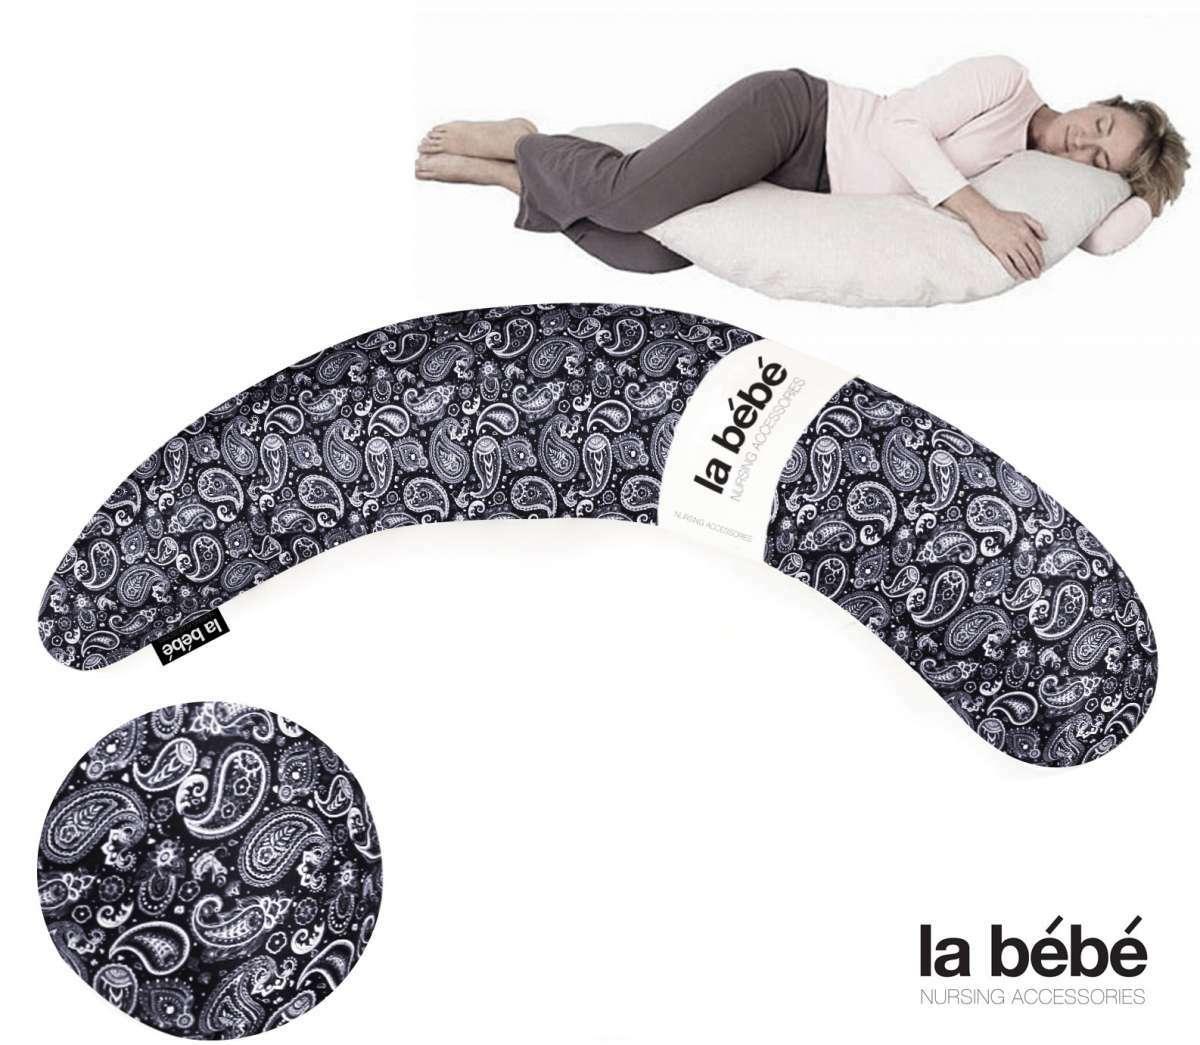 La Bebe™ Moon Maternity Pillow Cover Art.17495  Papildus pārvalks pakaviņam 36*185 cm